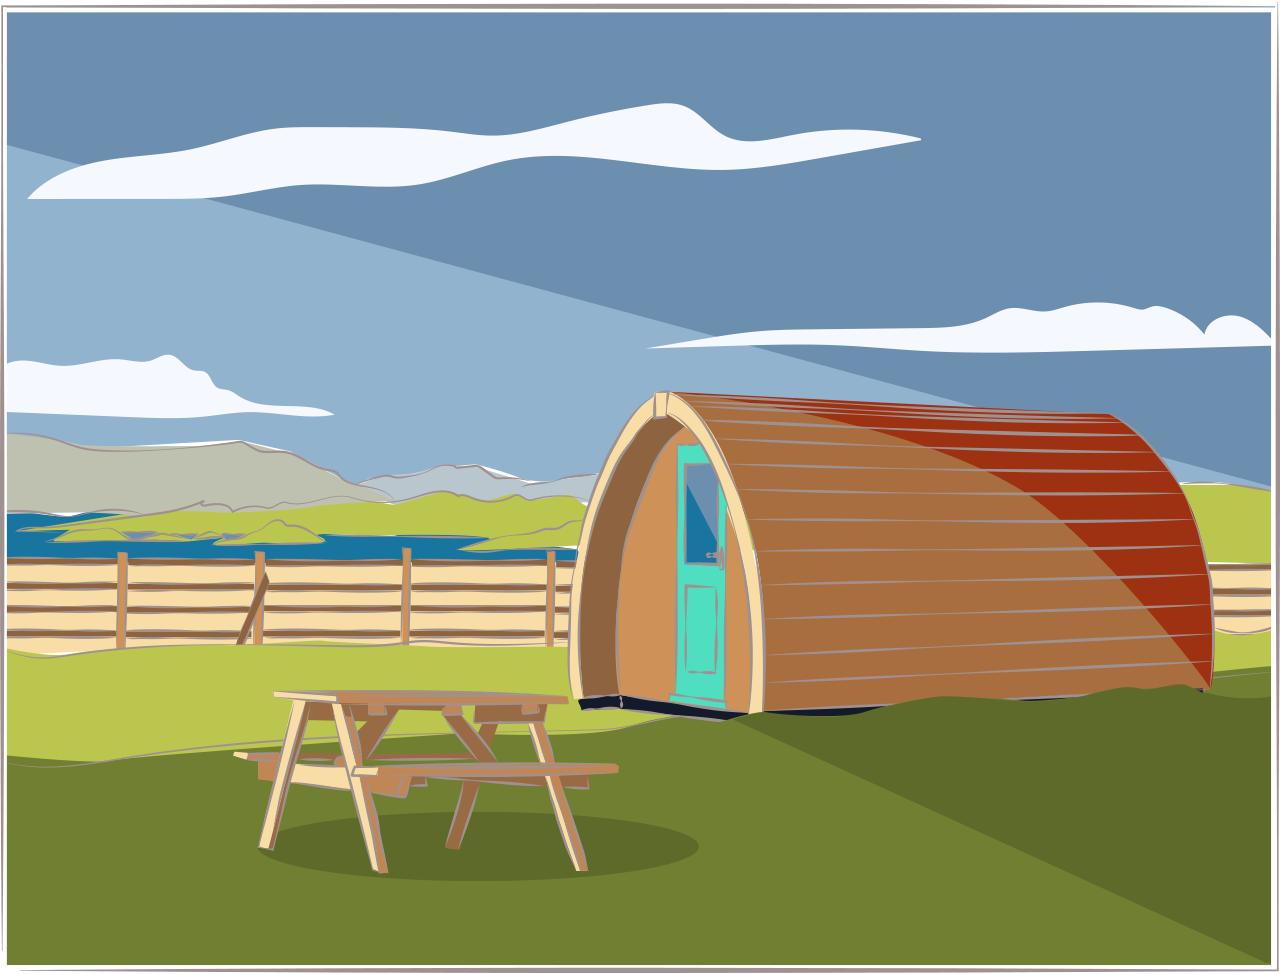 Illustration of a remote cabin